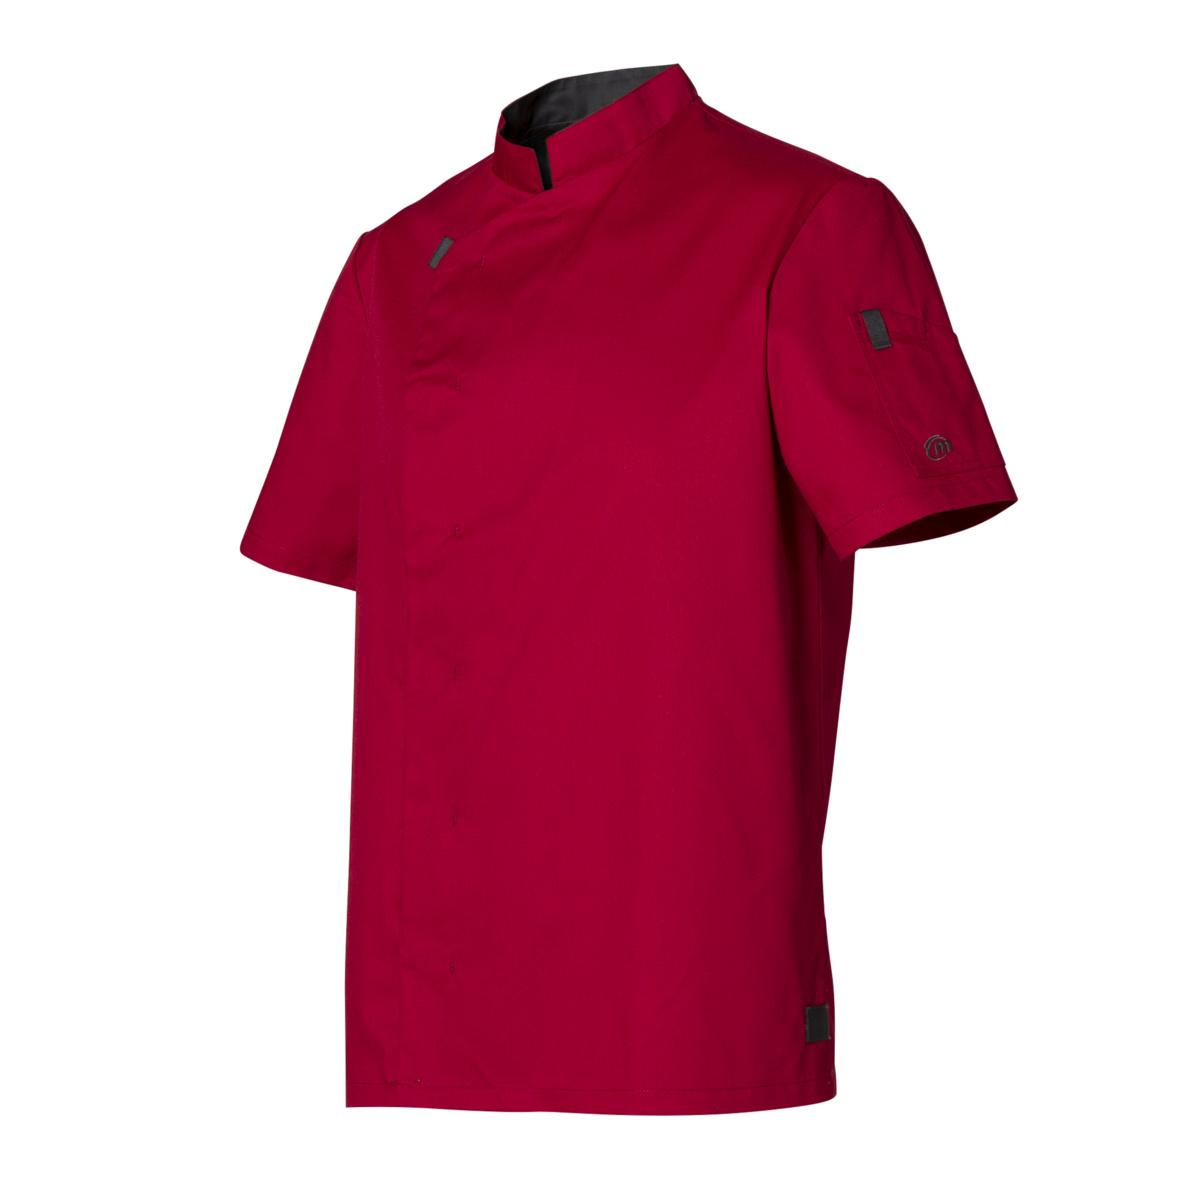 Veste de cuisine rouge taille 6 Shade Molinel